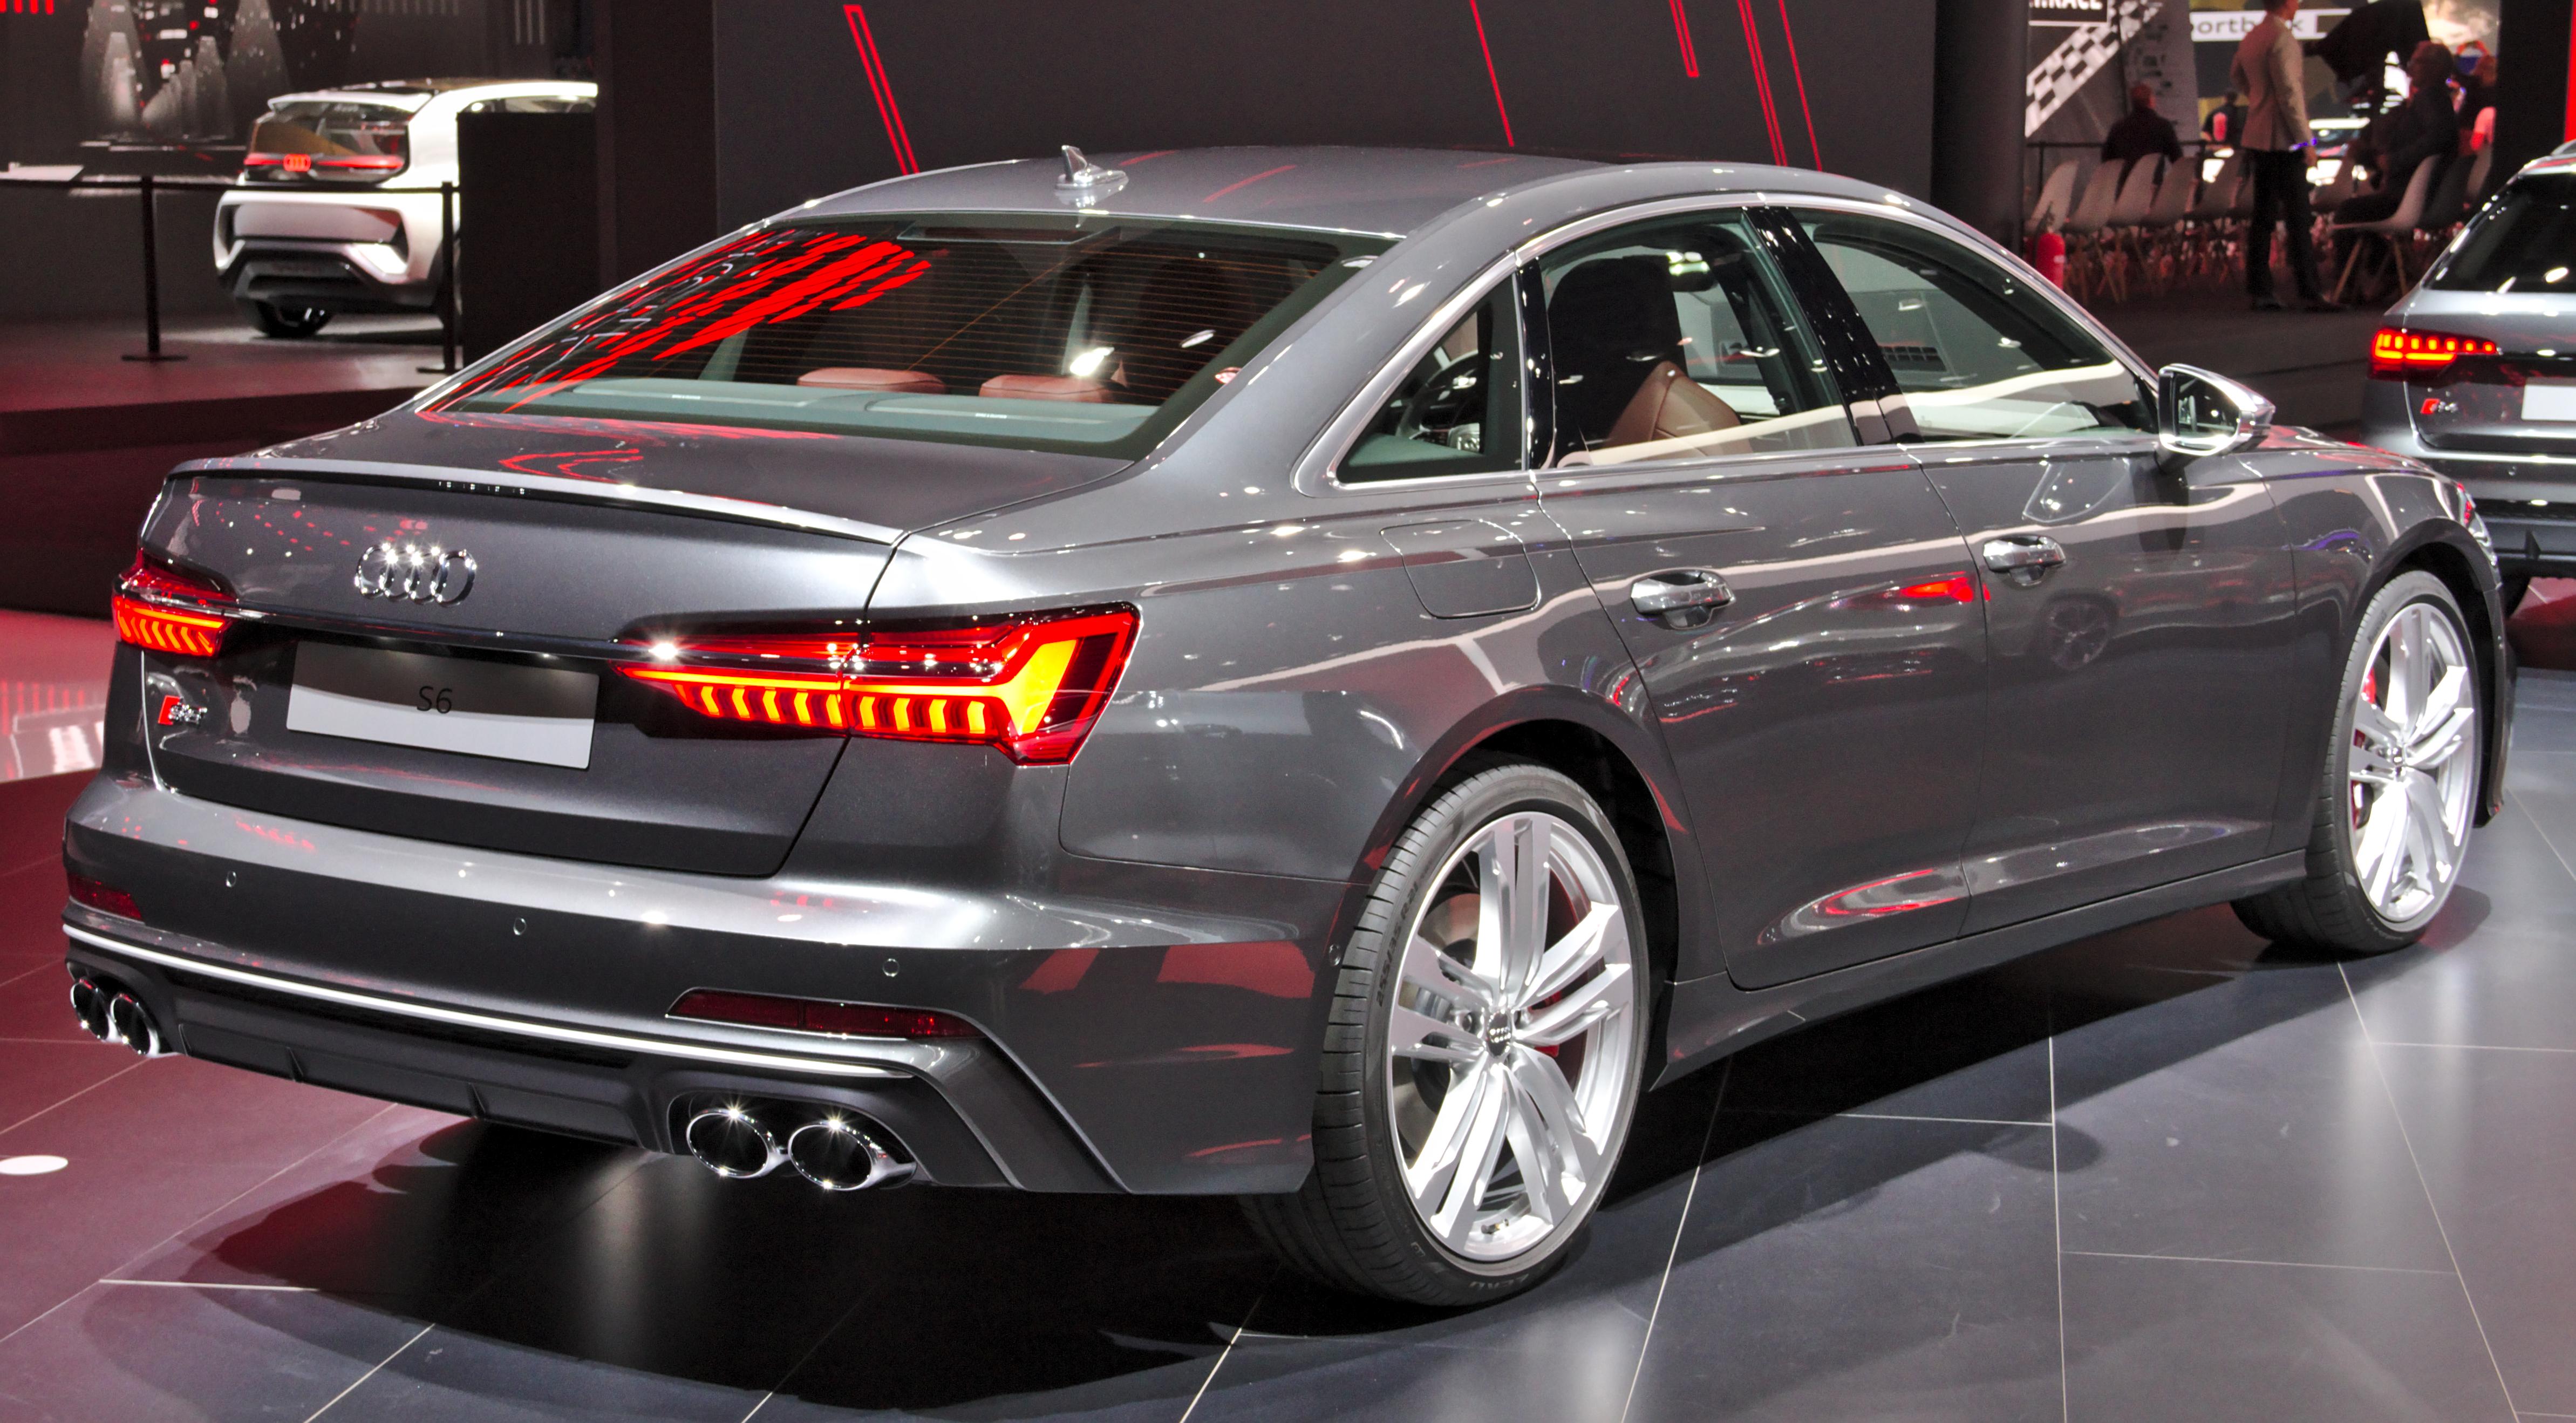 File:Audi S6 C8 at IAA 2019 IMG 0302.jpg - Wikimedia Commons